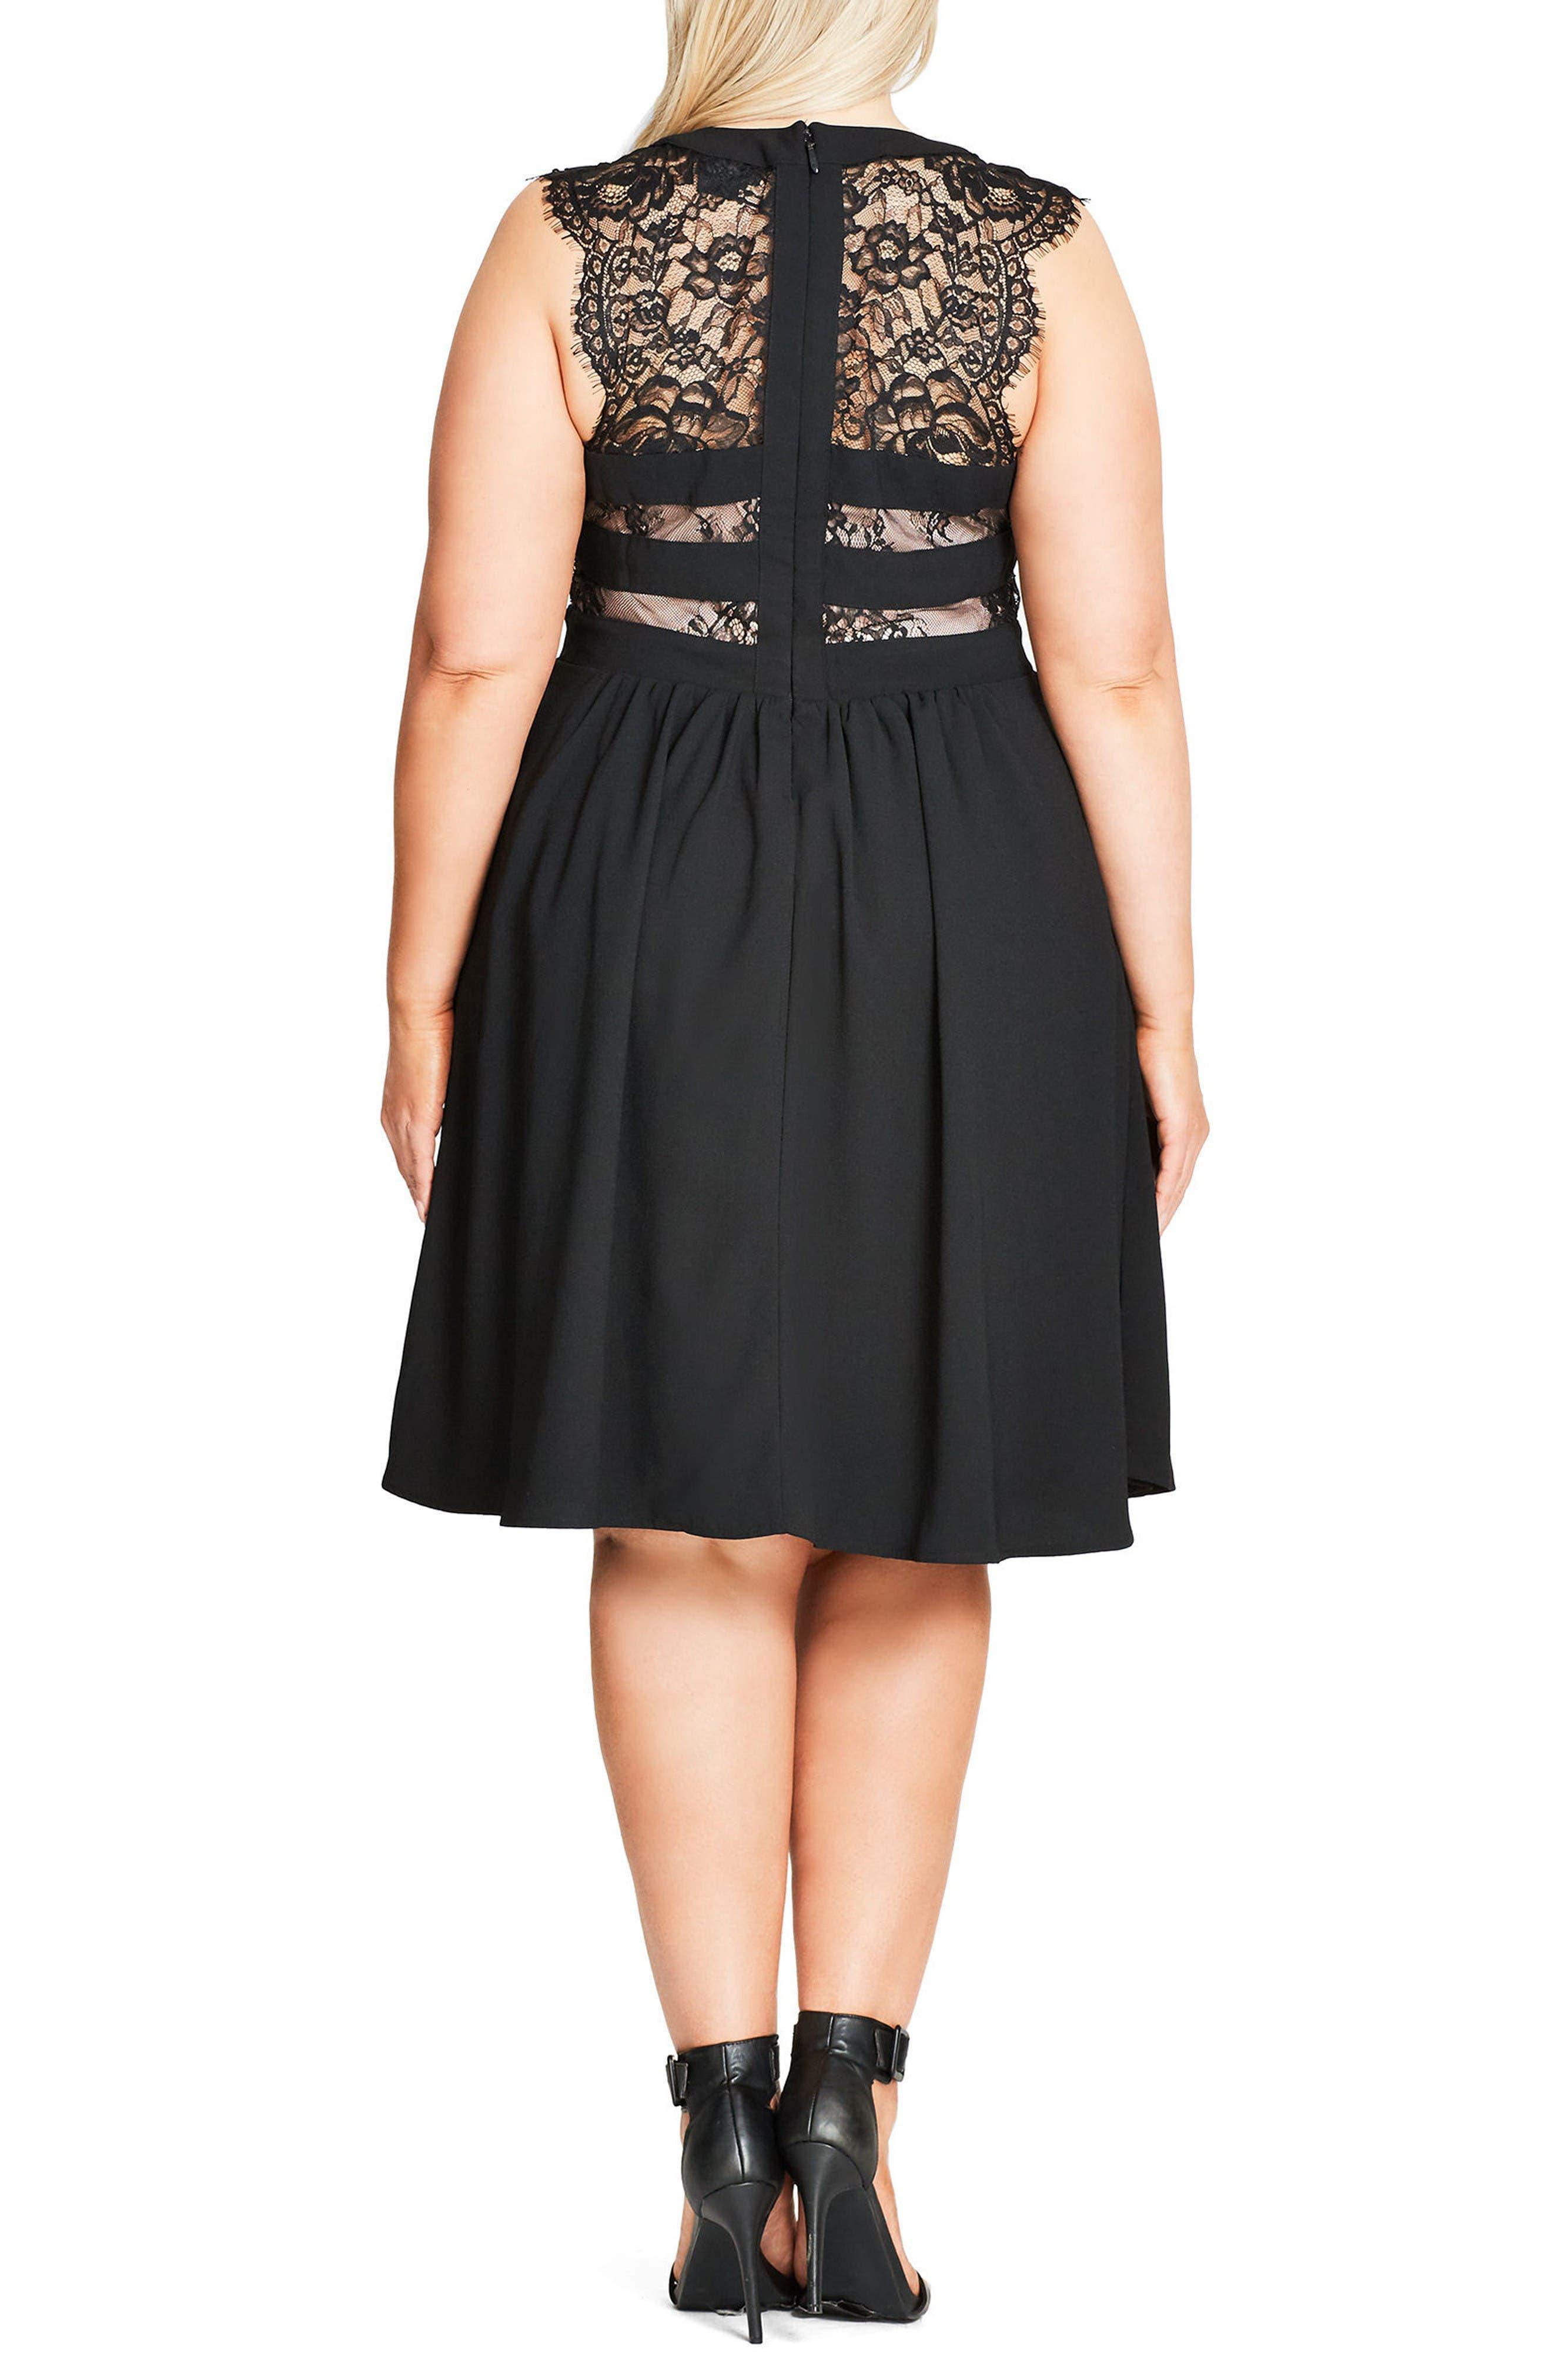 Cage Dress,                             Alternate thumbnail 2, color,                             Black